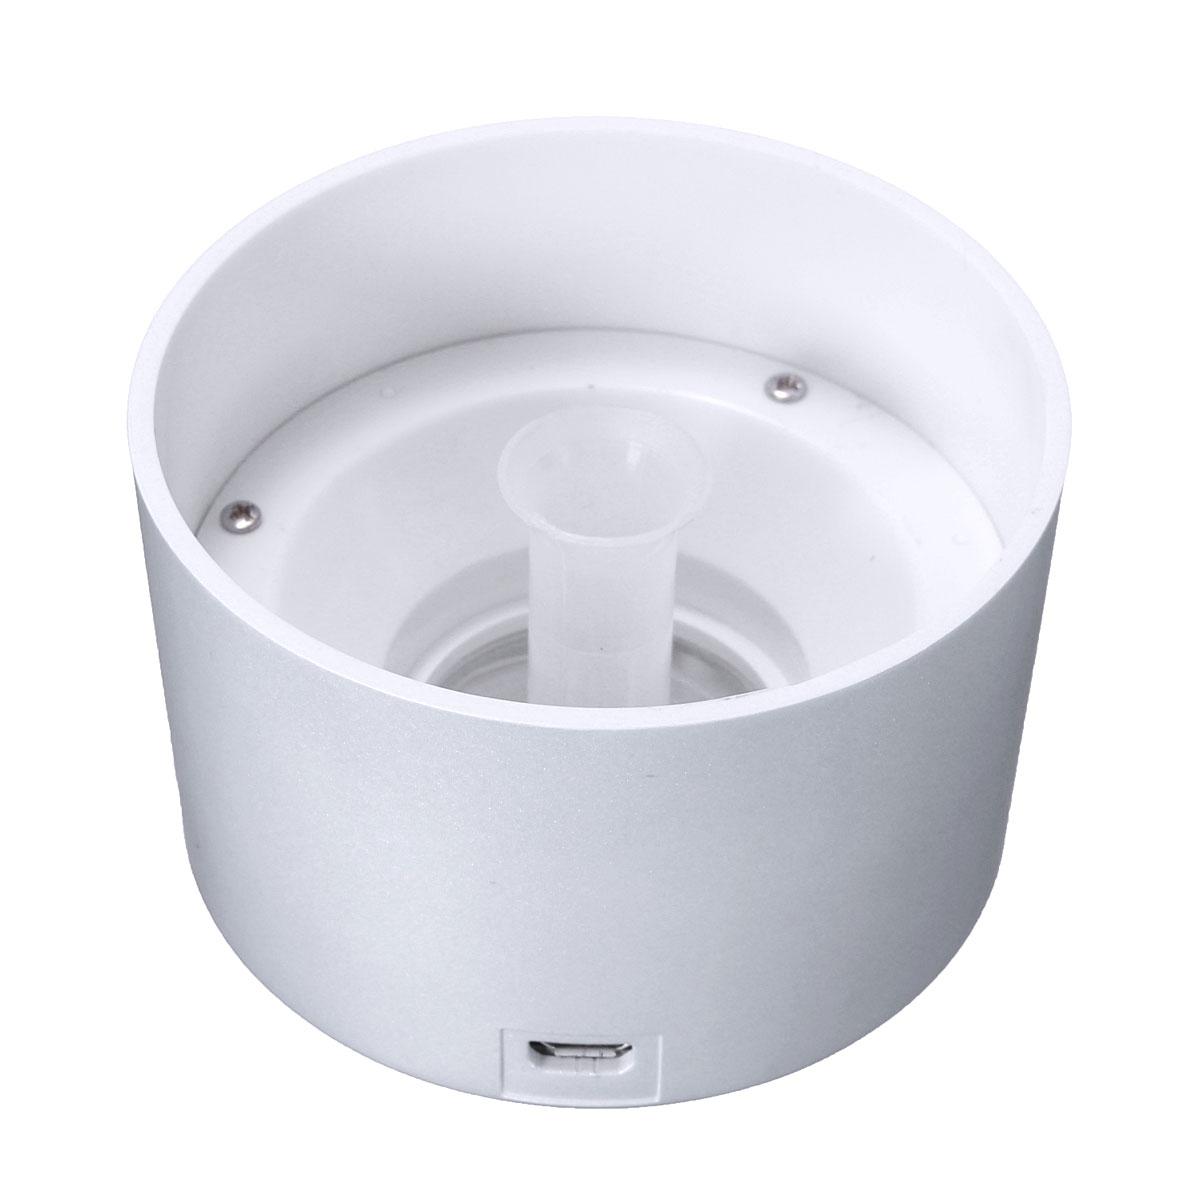 Portable Mini Water Bottle Caps USB Humidifier Aroma Air Diffuser Mist  #555A77